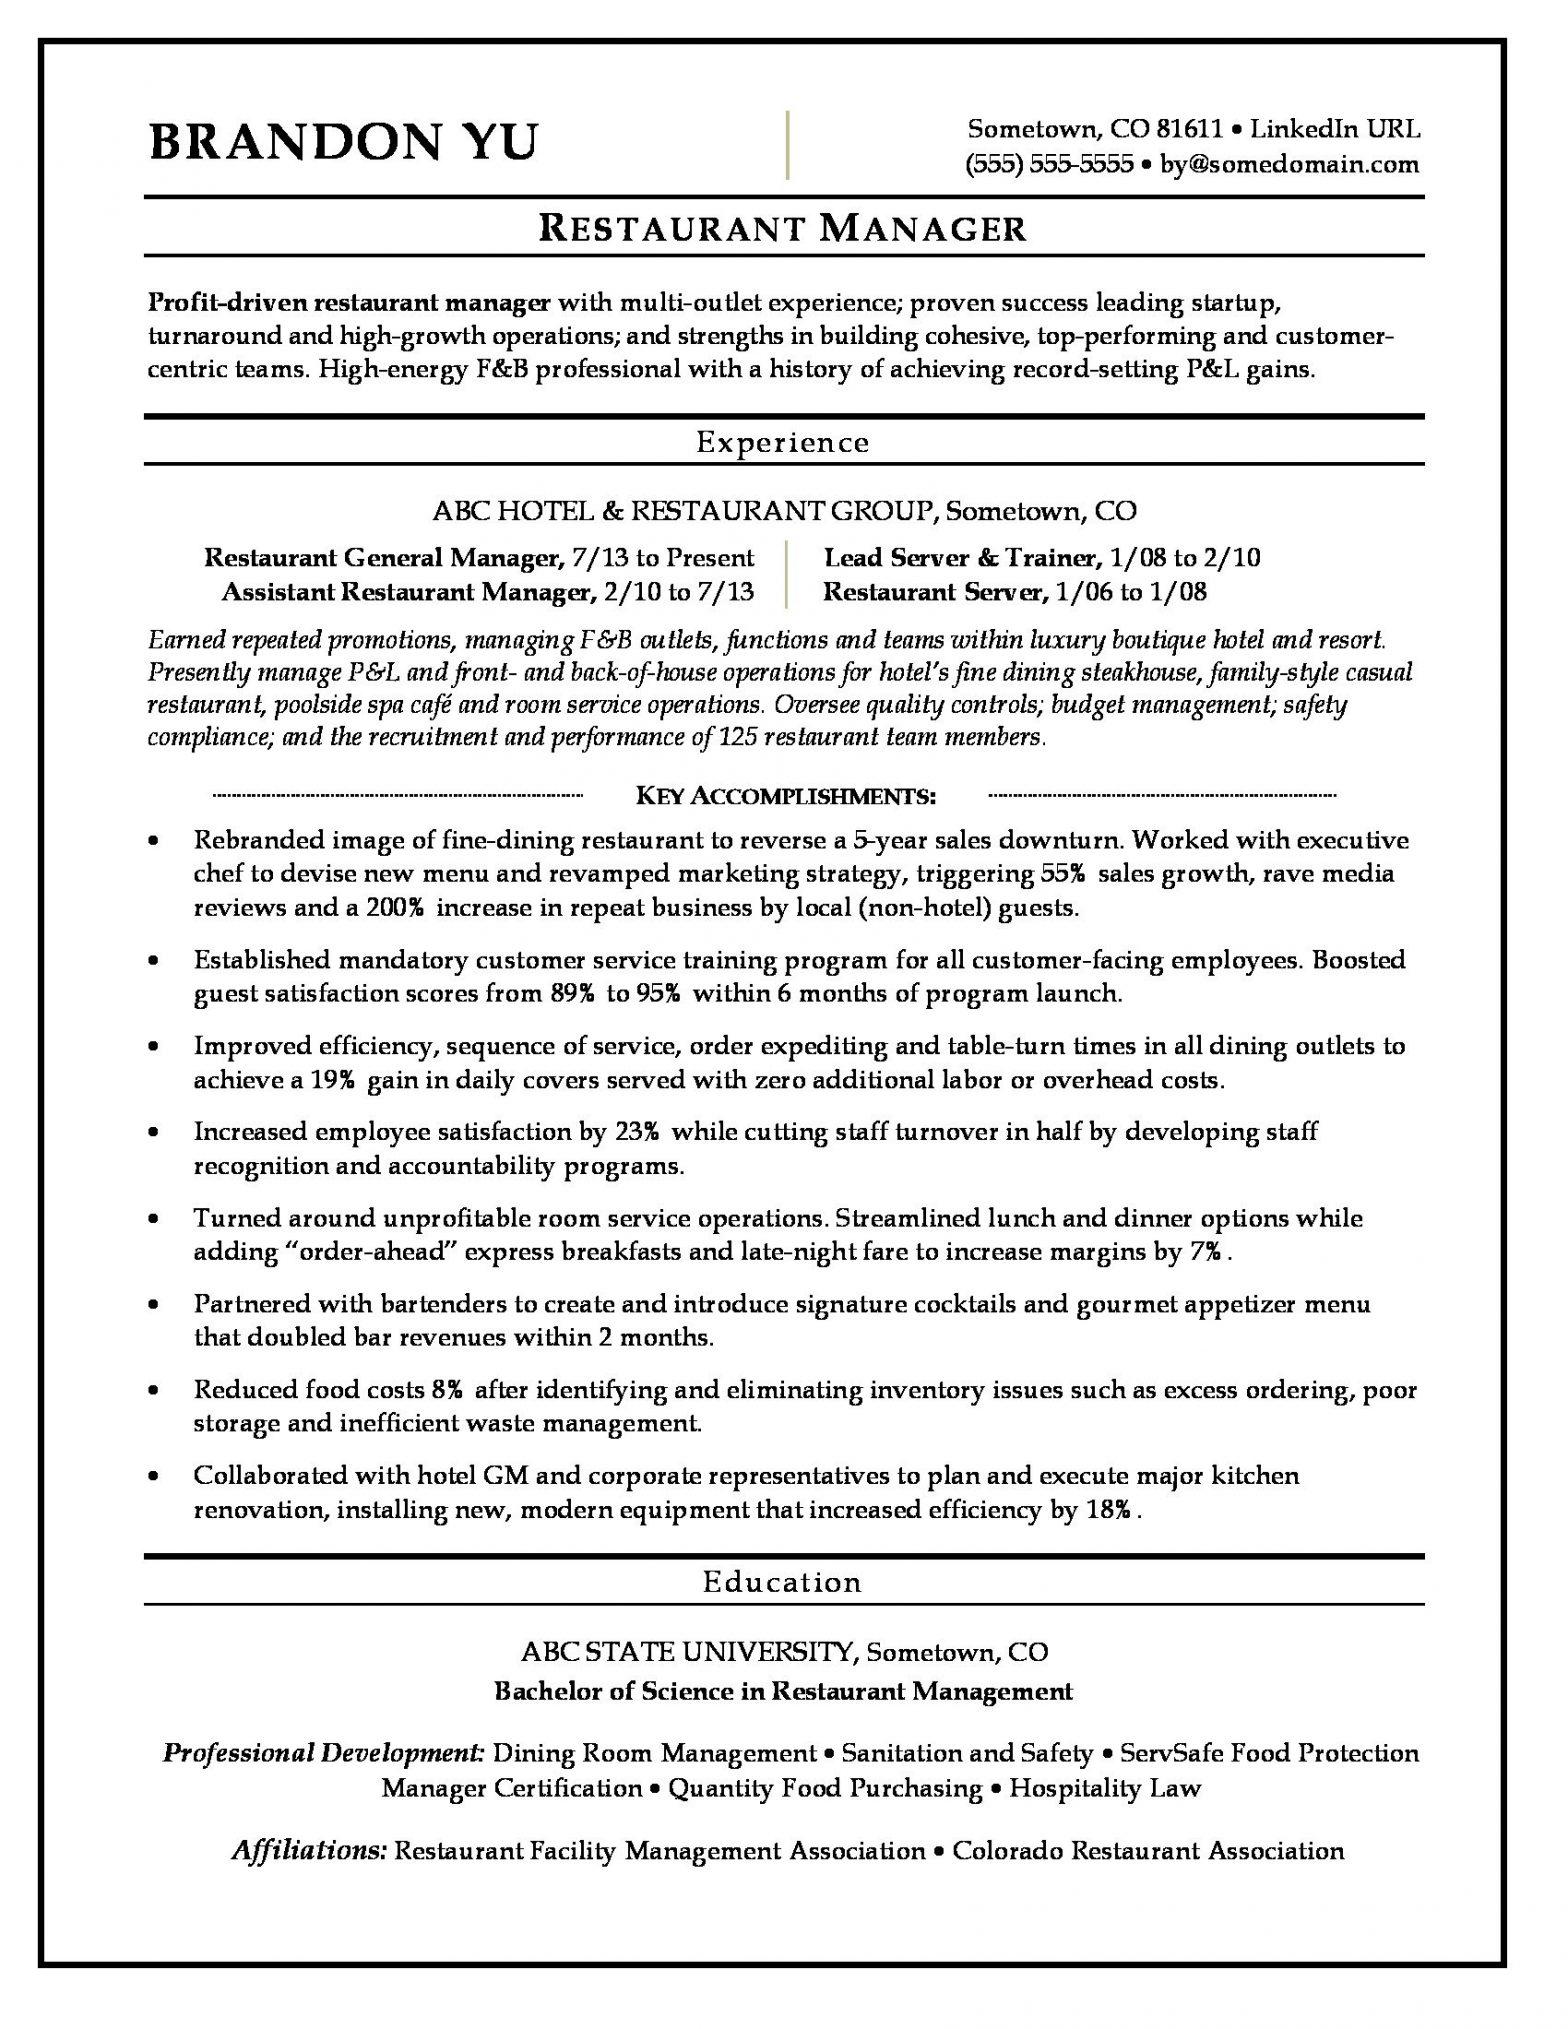 Sample Resume for Hotel and Restaurant Management Restaurant Manager Resume Sample Monster.com